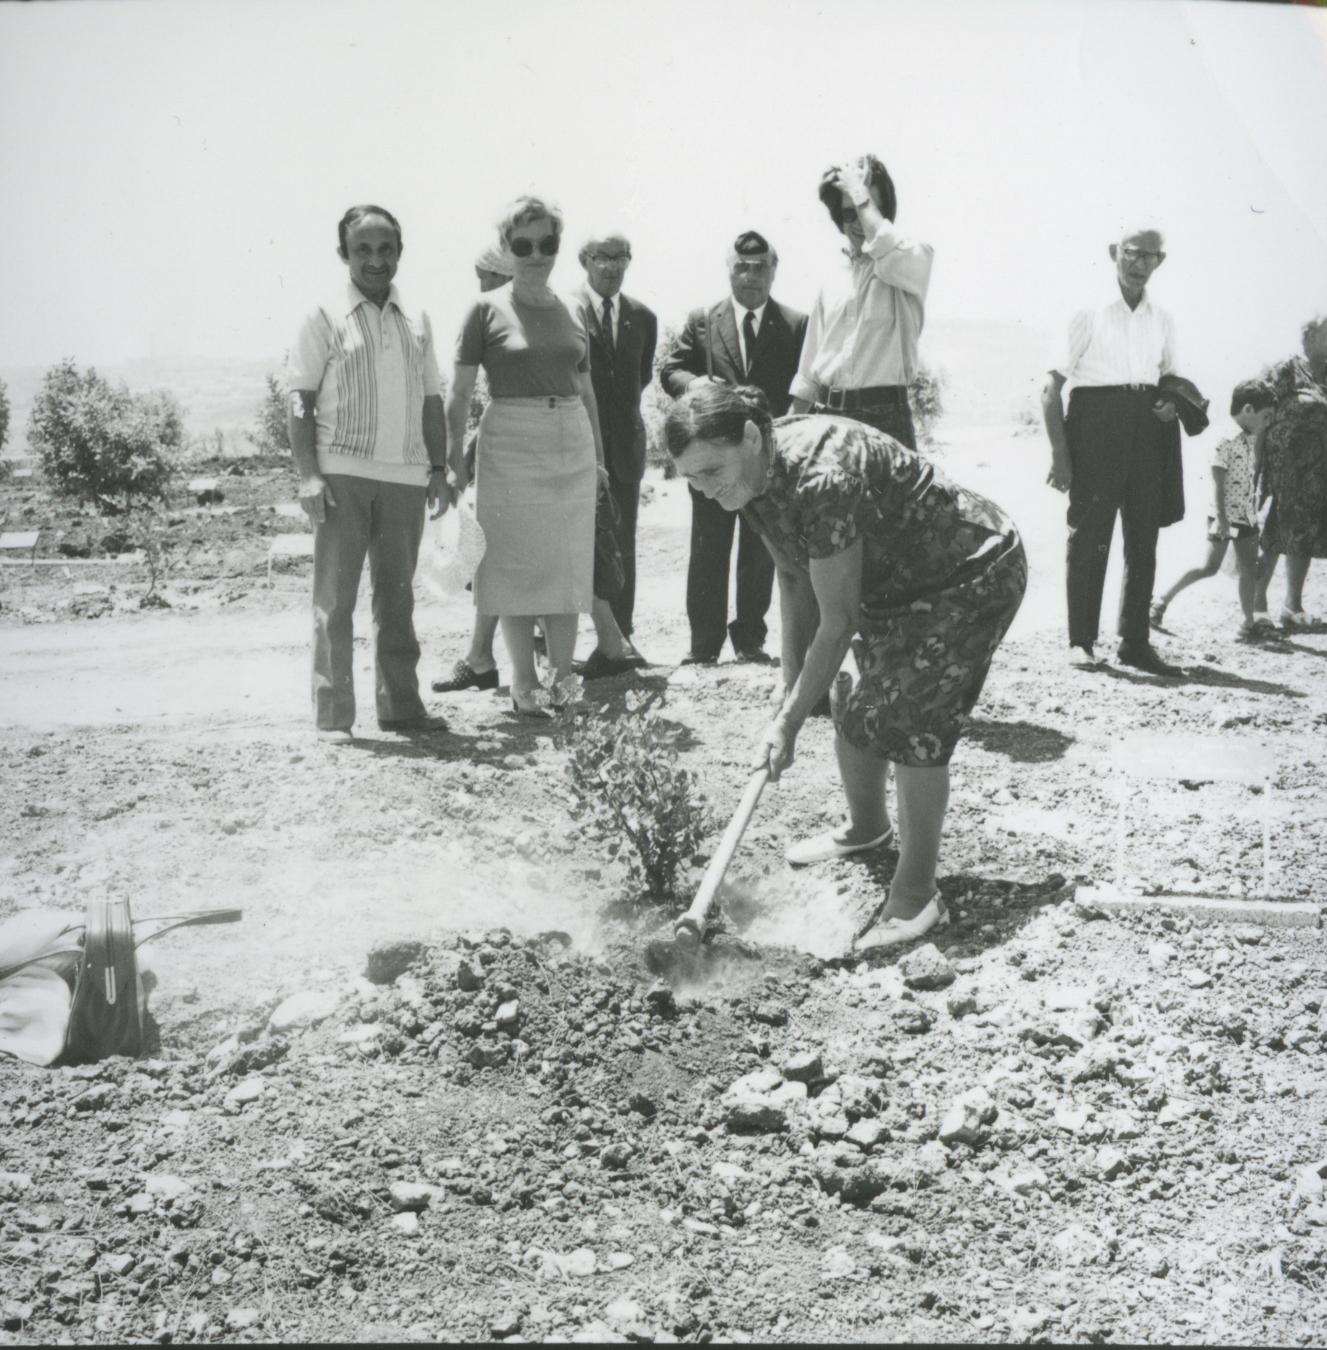 Tree Planting Ceremony in Honor of Wanda Pisula. Yad Vashem. 25.08.1976